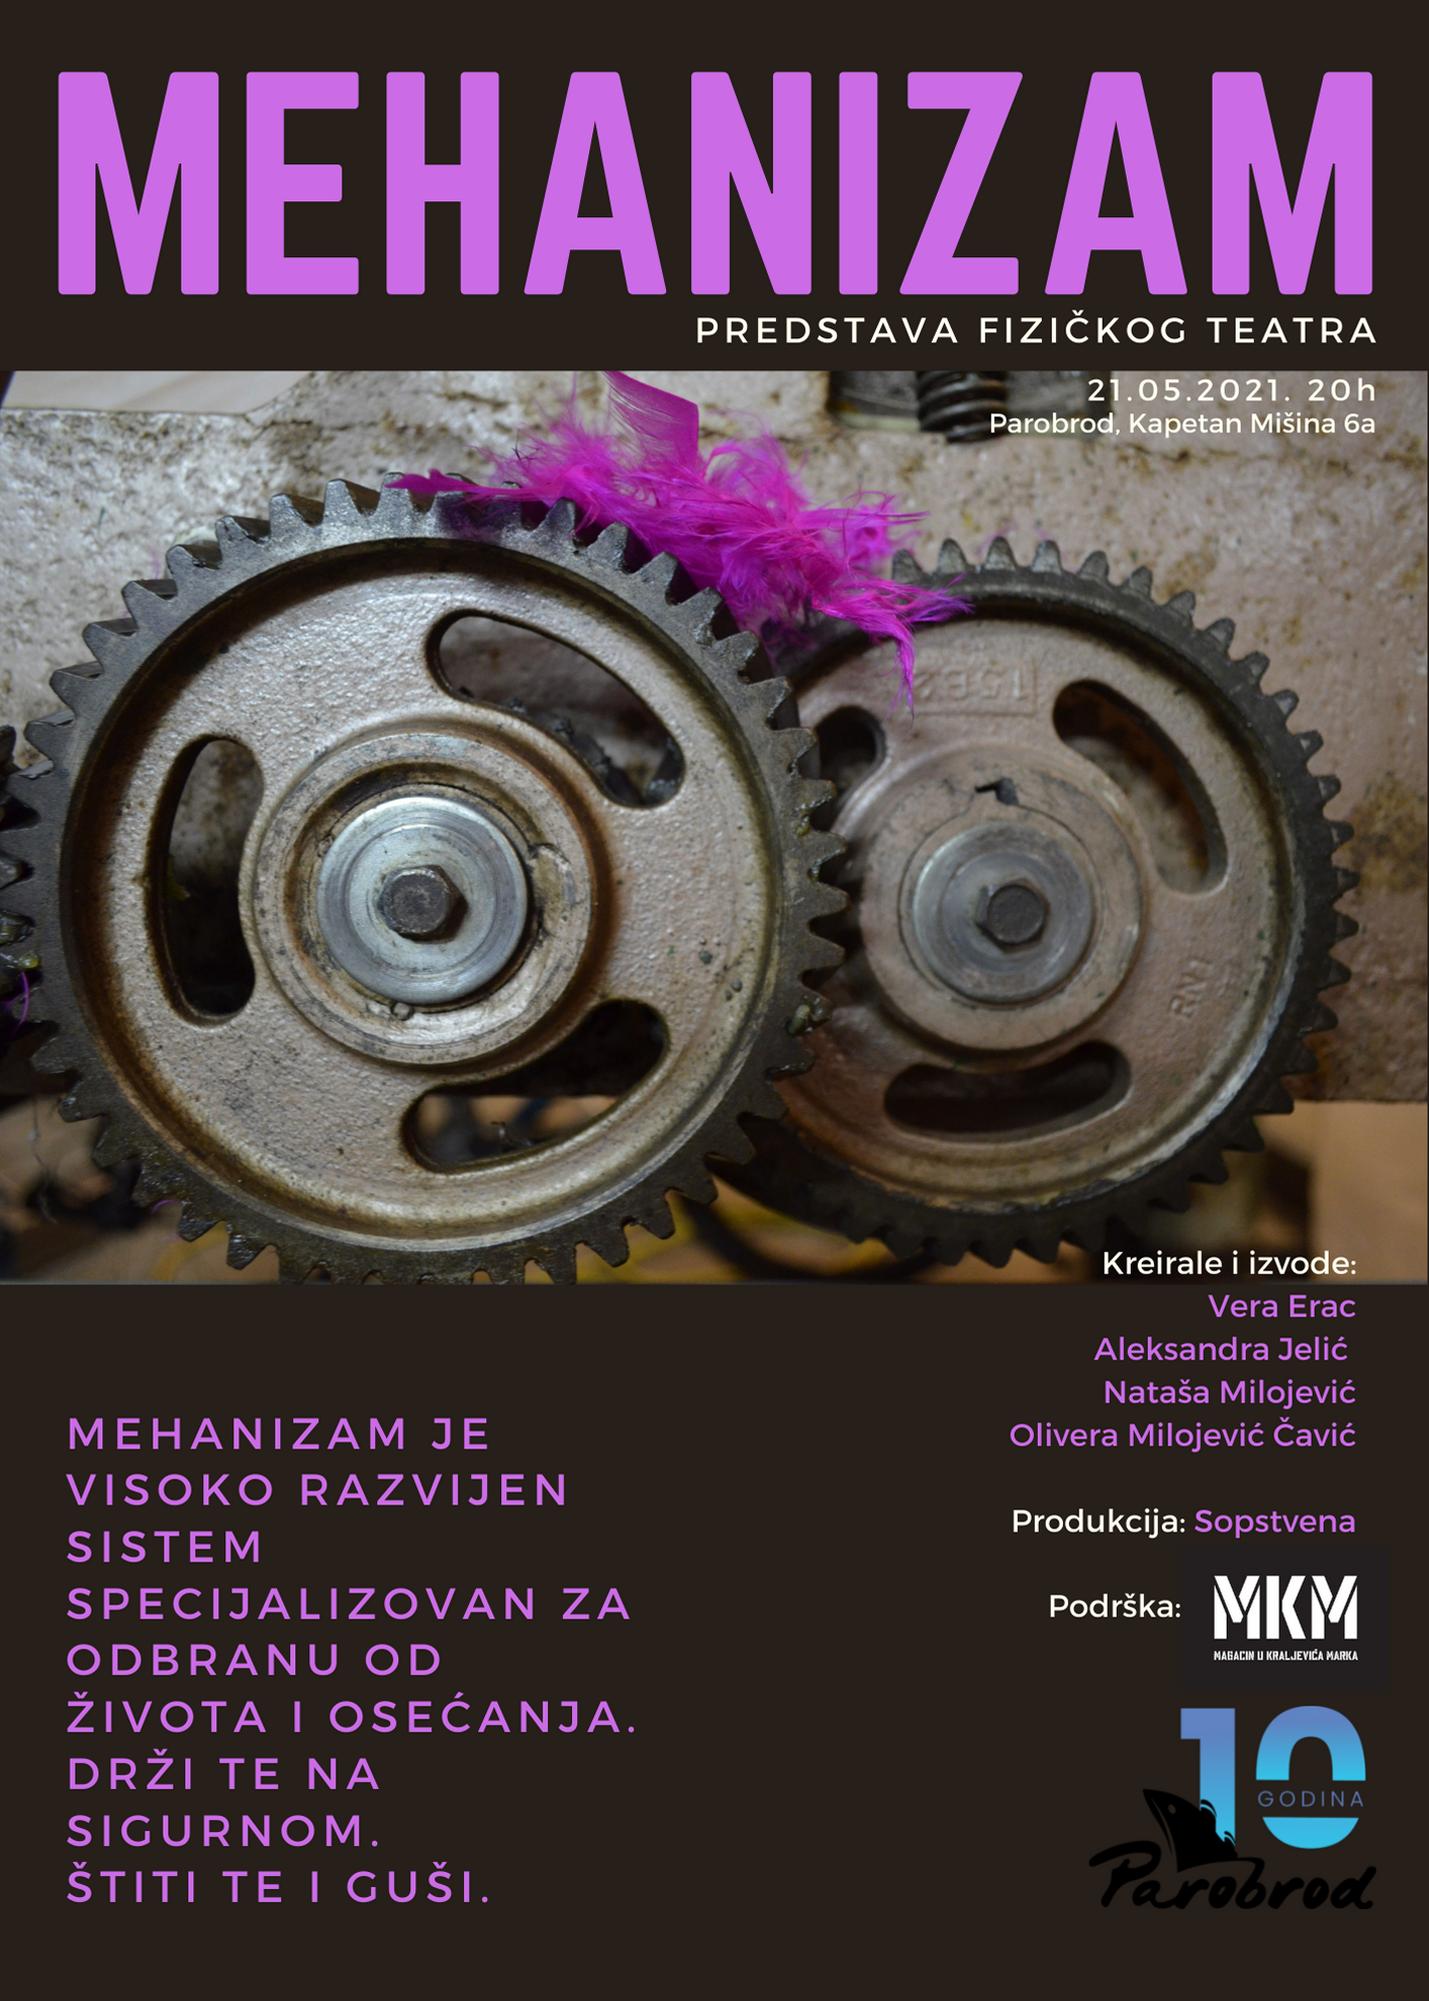 Mehanizam predstava fizičkog teatra